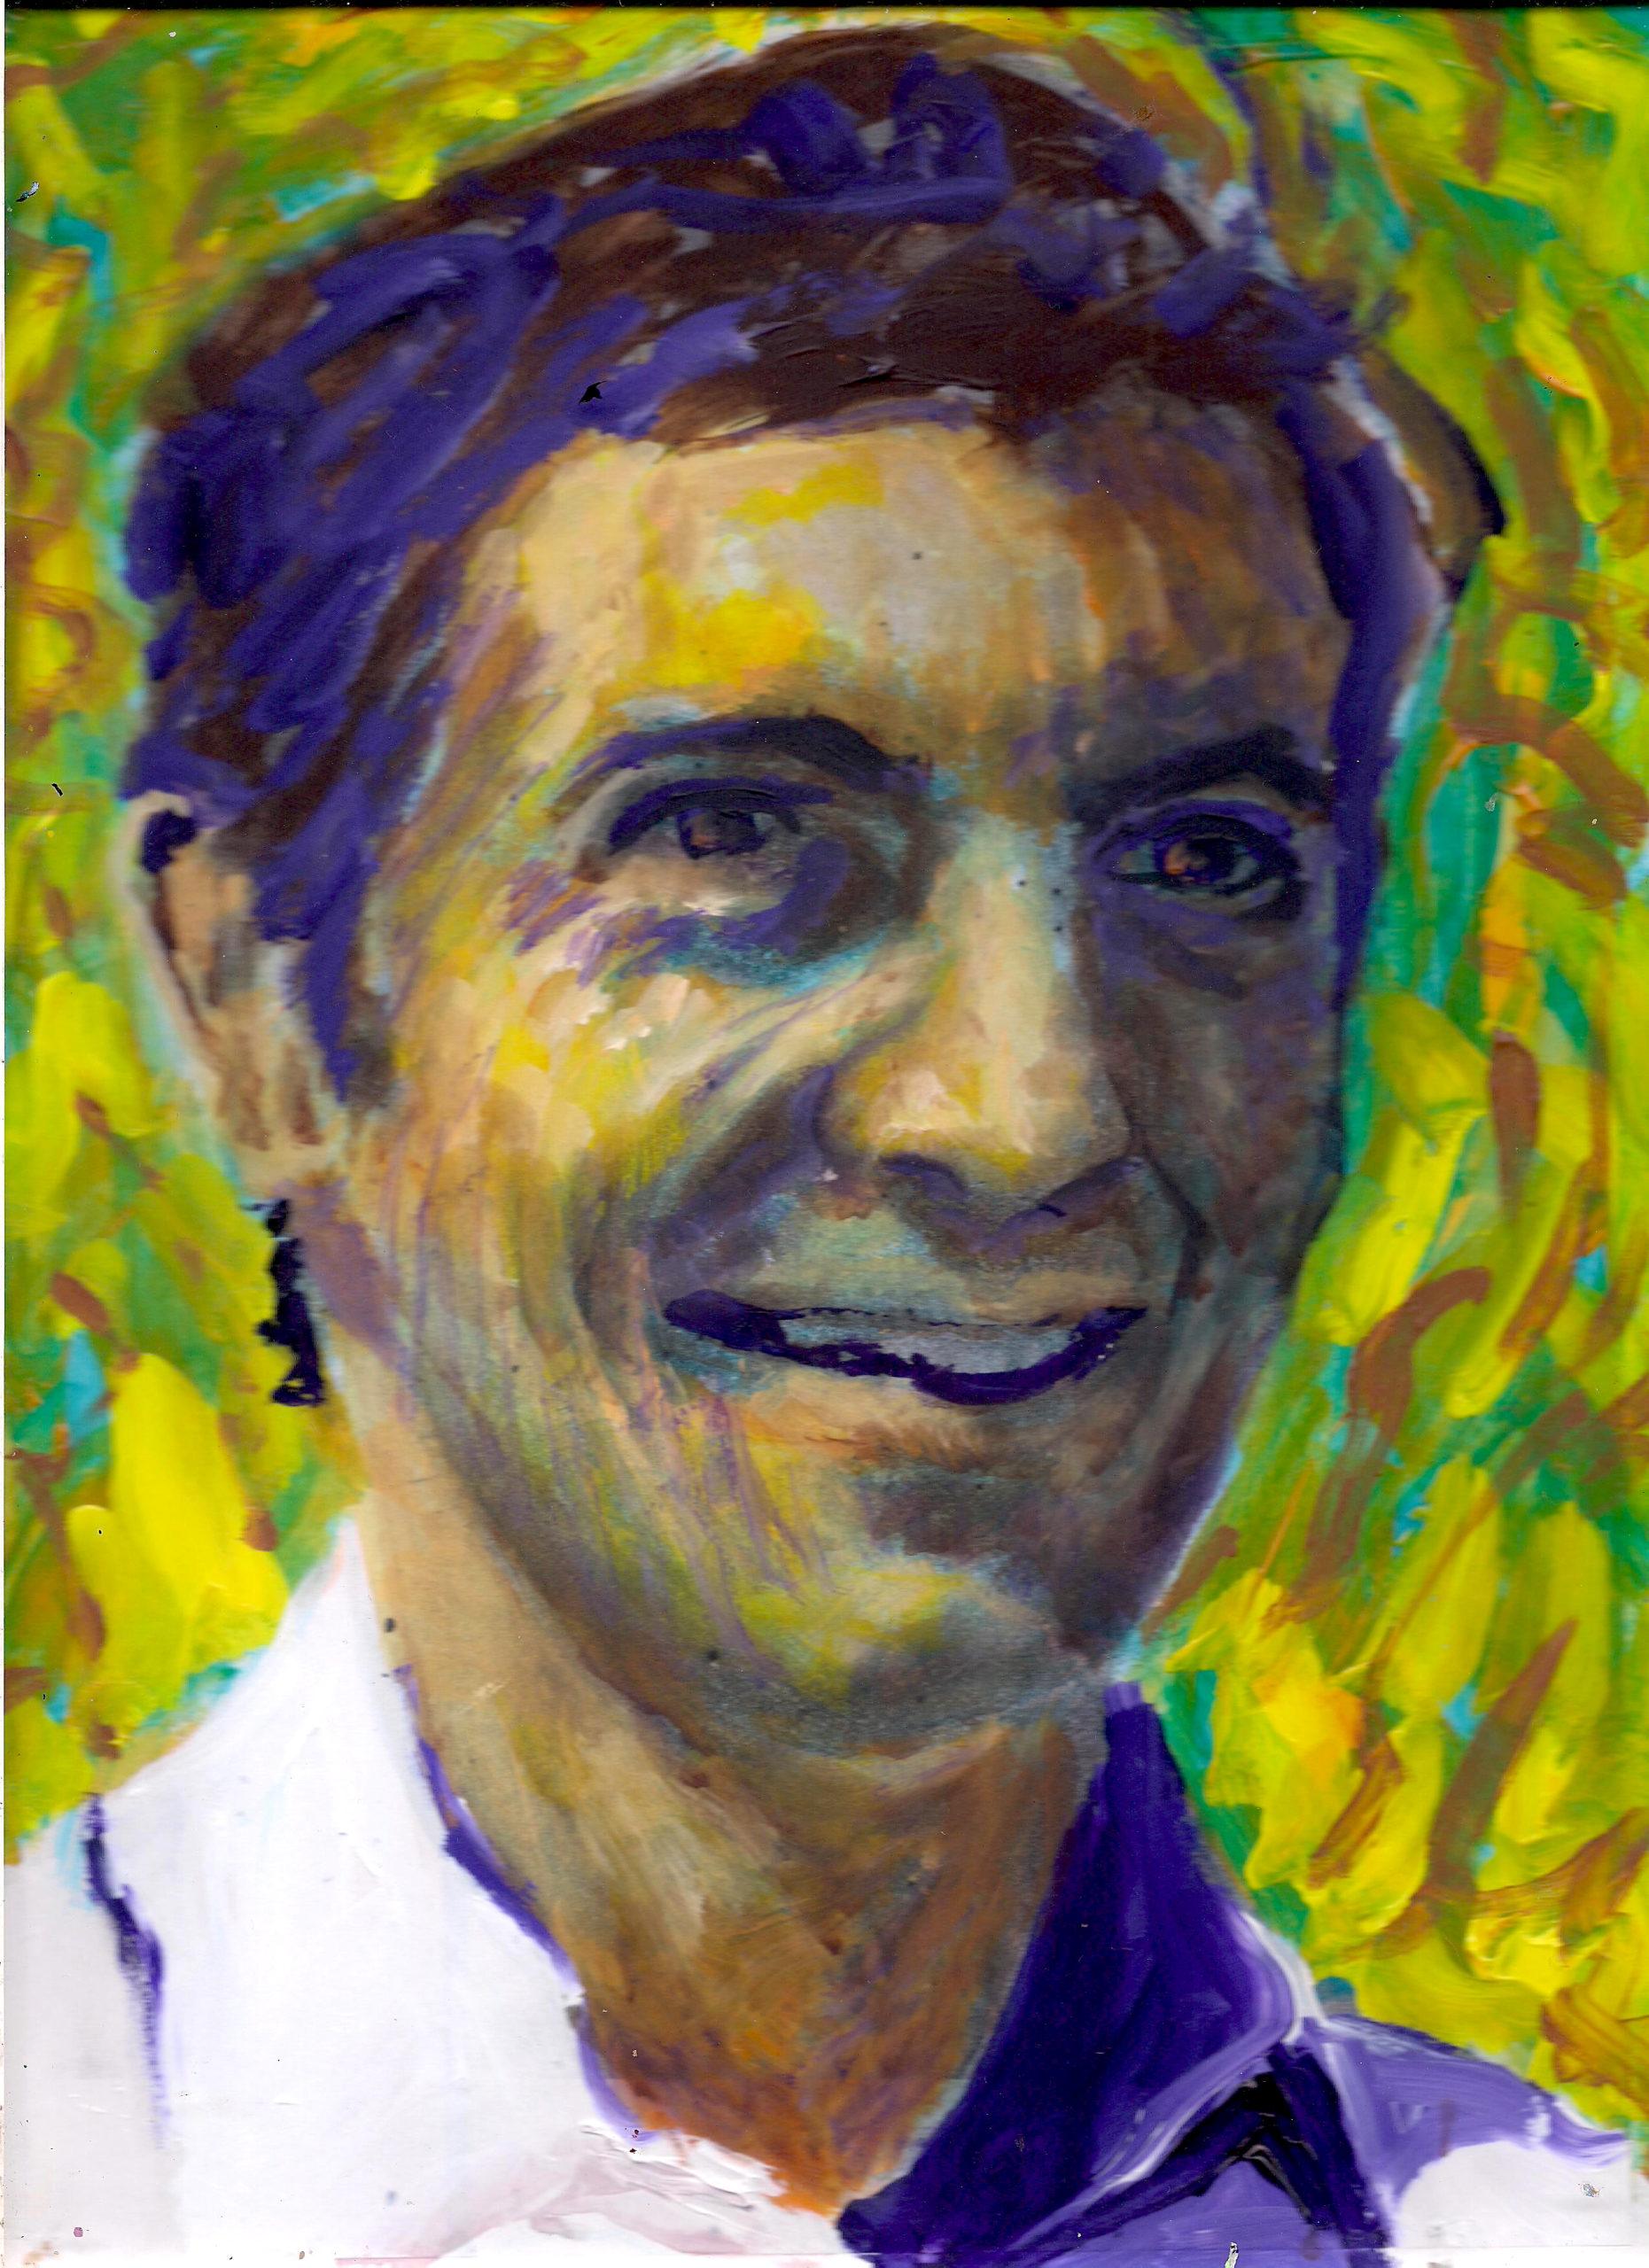 Miguel Andres del Valle